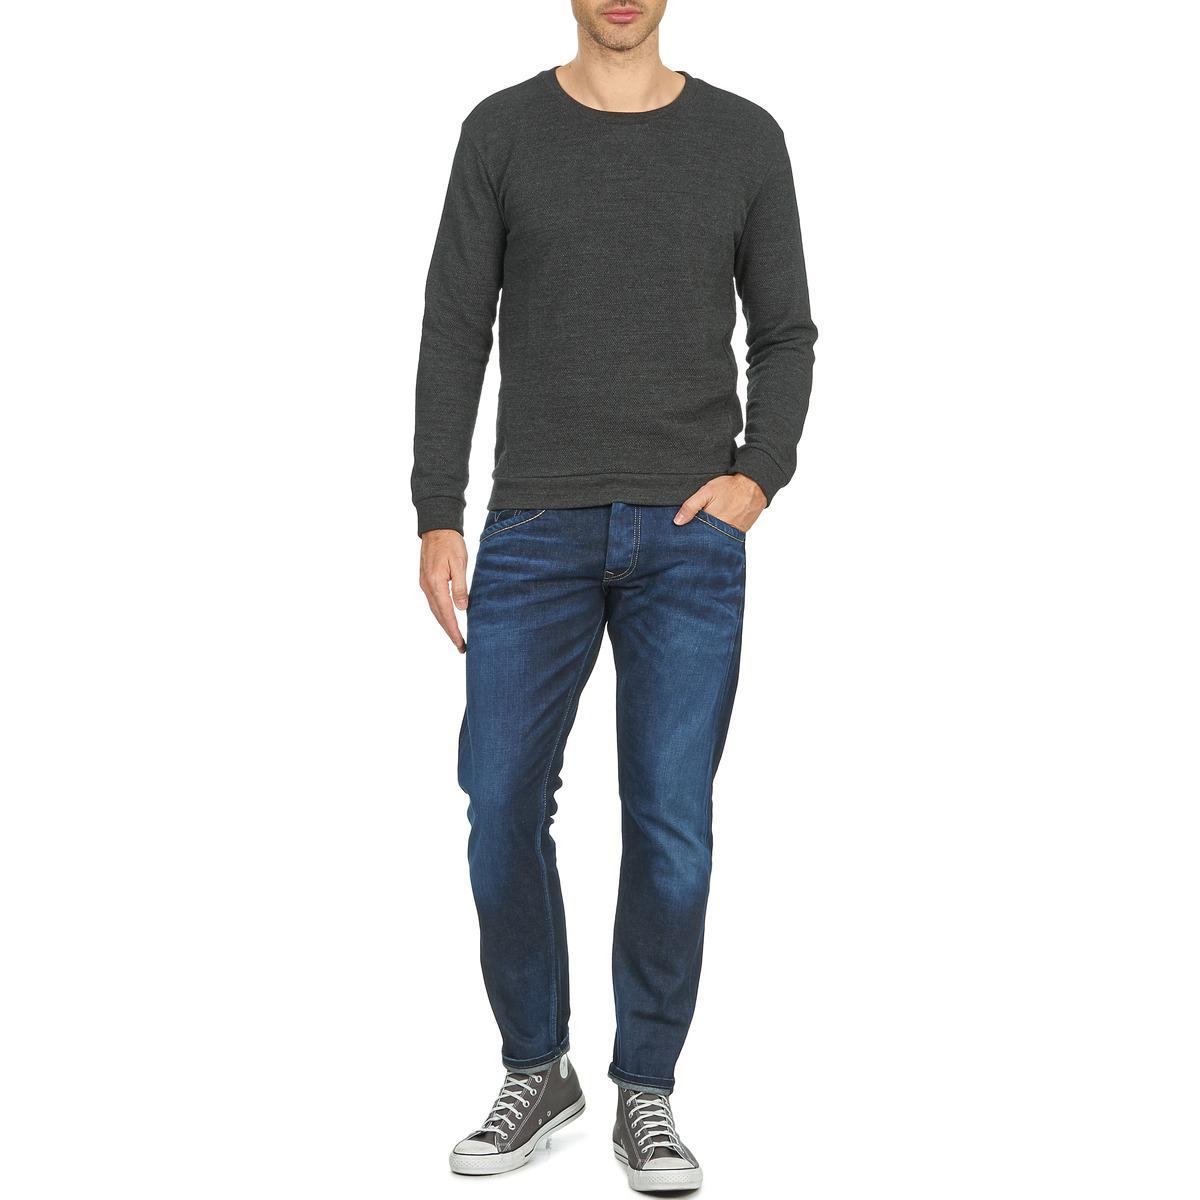 Pepe Jeans Denim Kolt Jeans in Blue for Men